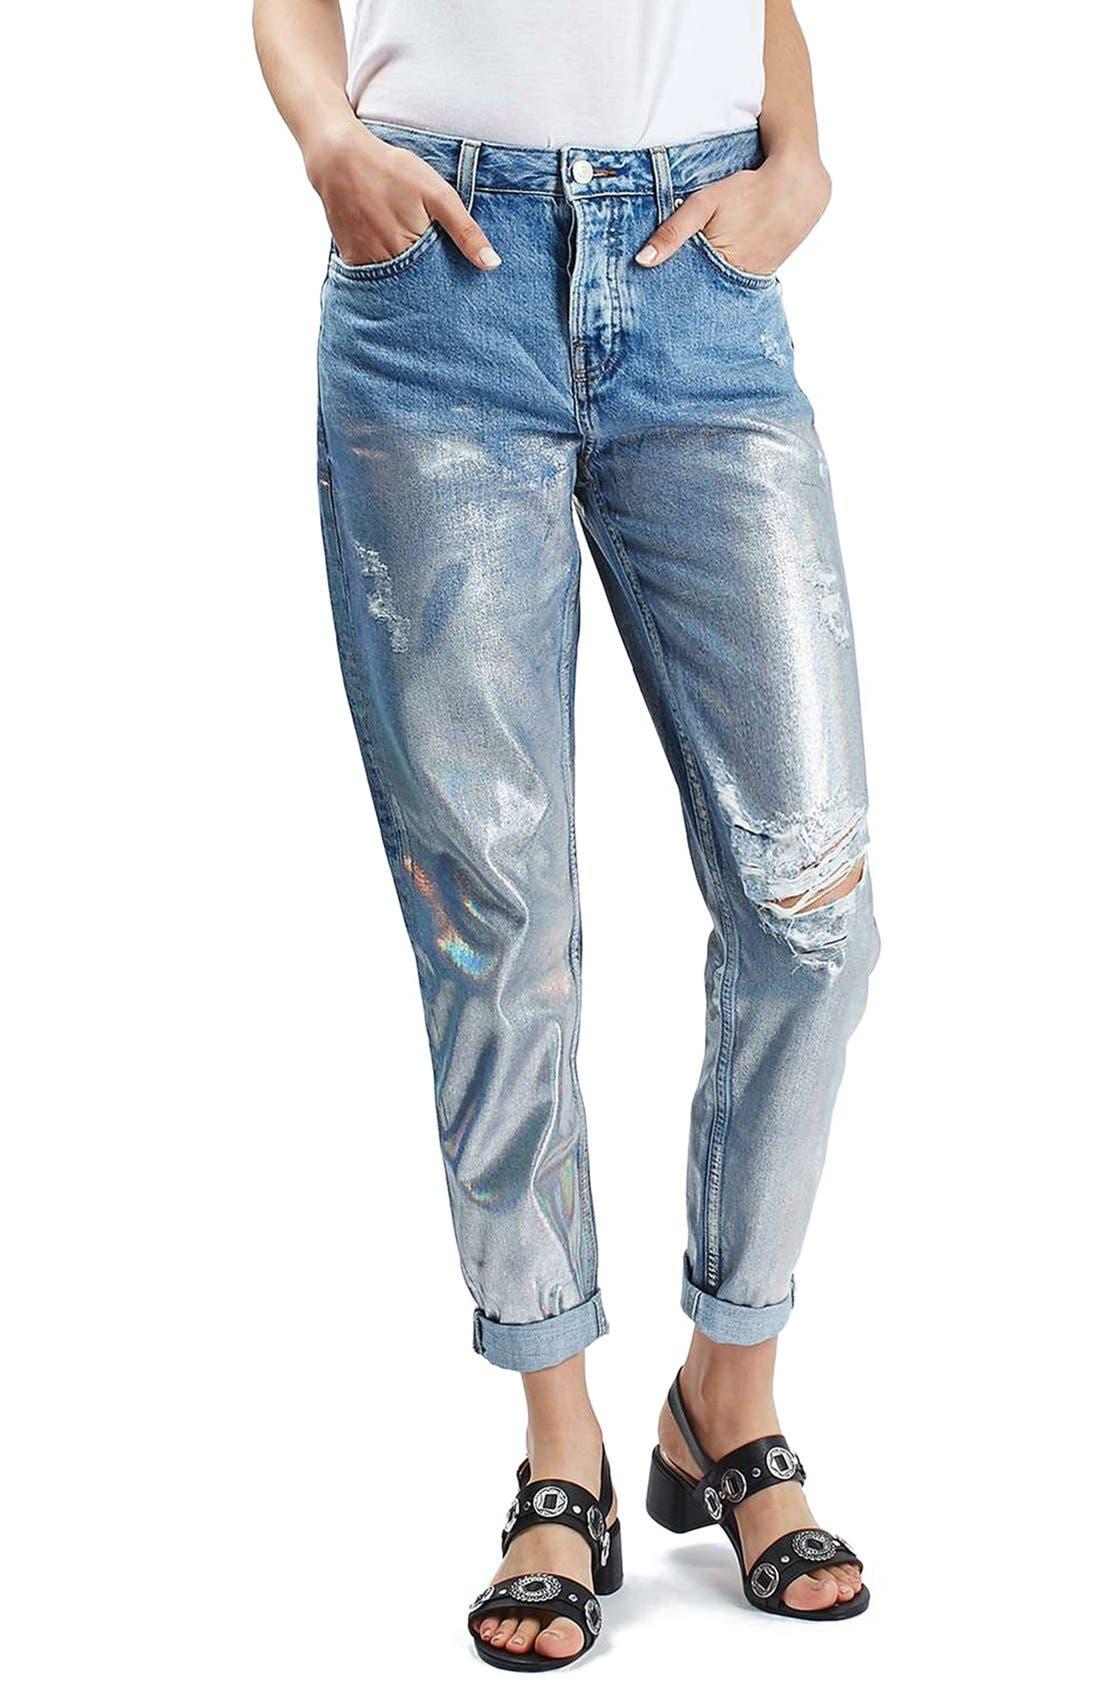 Alternate Image 1 Selected - Topshop 'Hayden' Metallic Distressed Boyfriend Jeans (Regular & Petite)